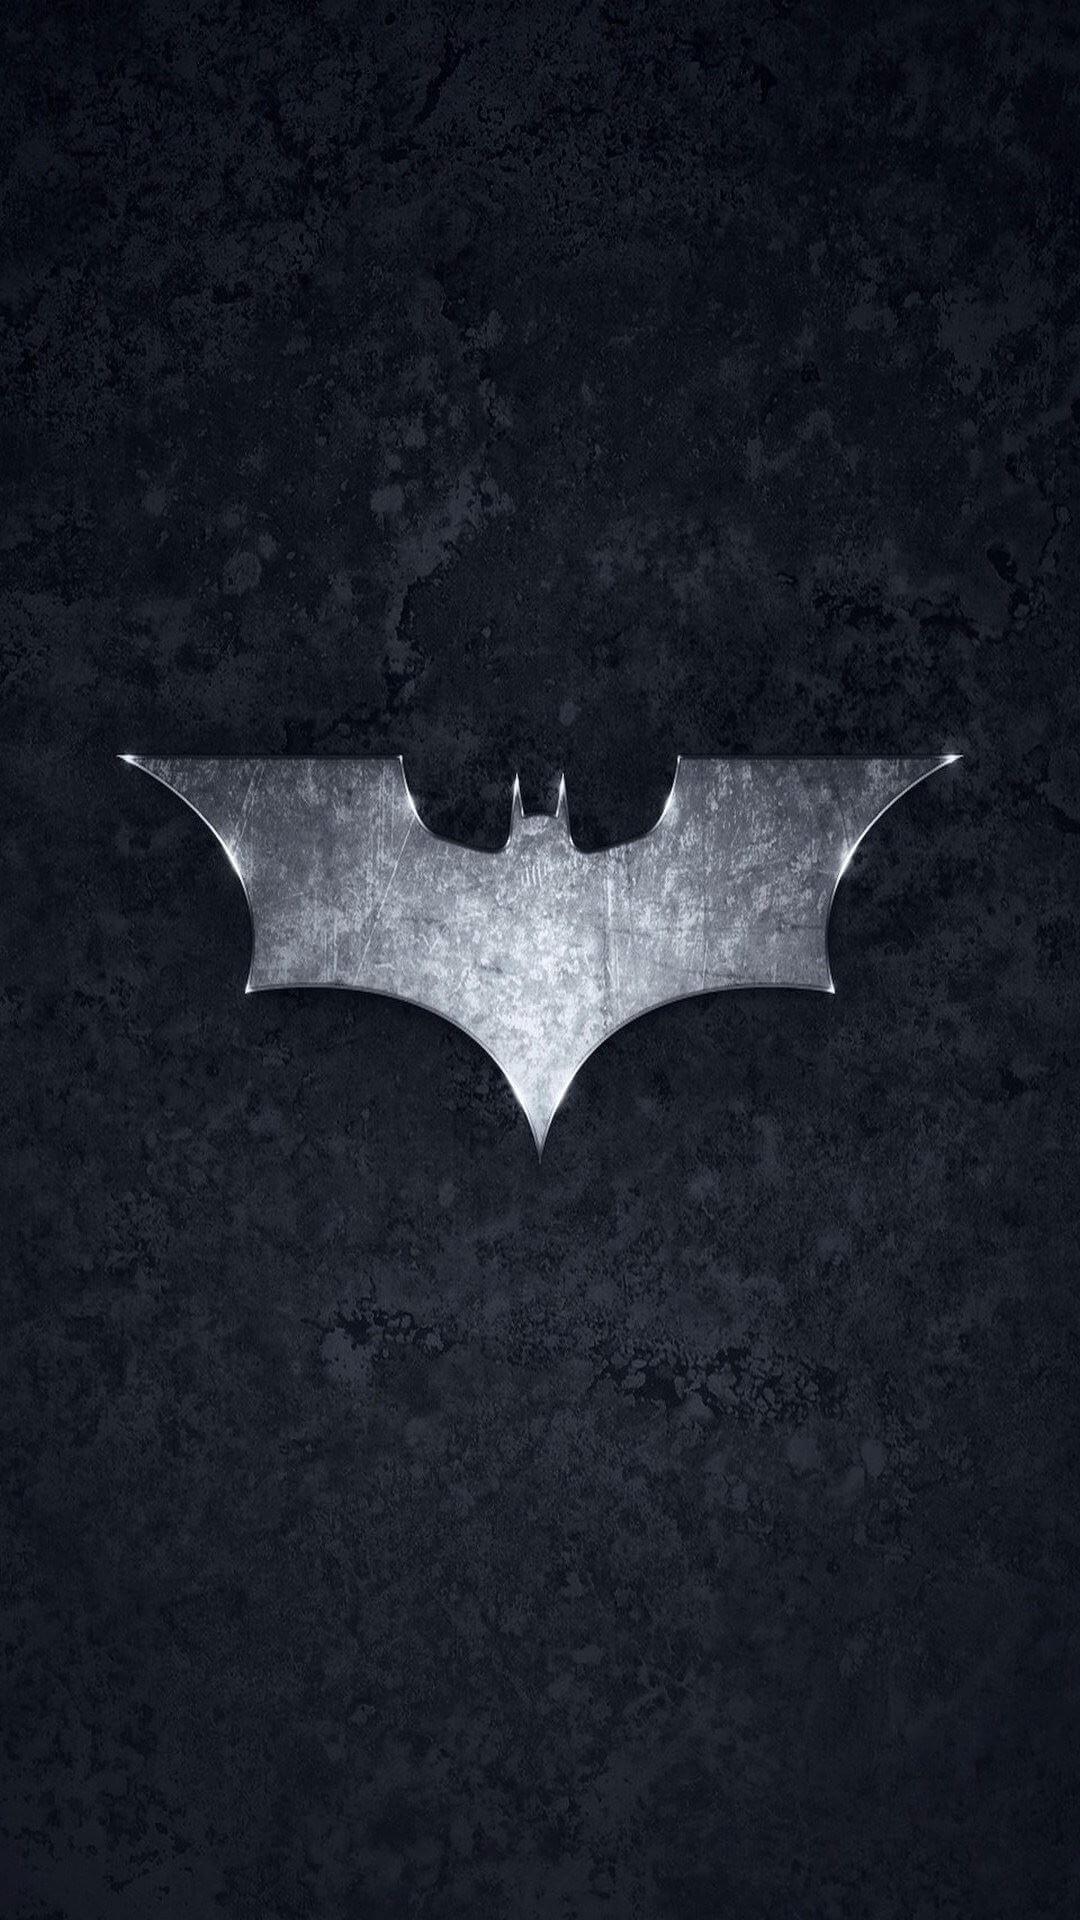 Batman VS Superman HD Wallpapers for OnePlus 3 1080x1920